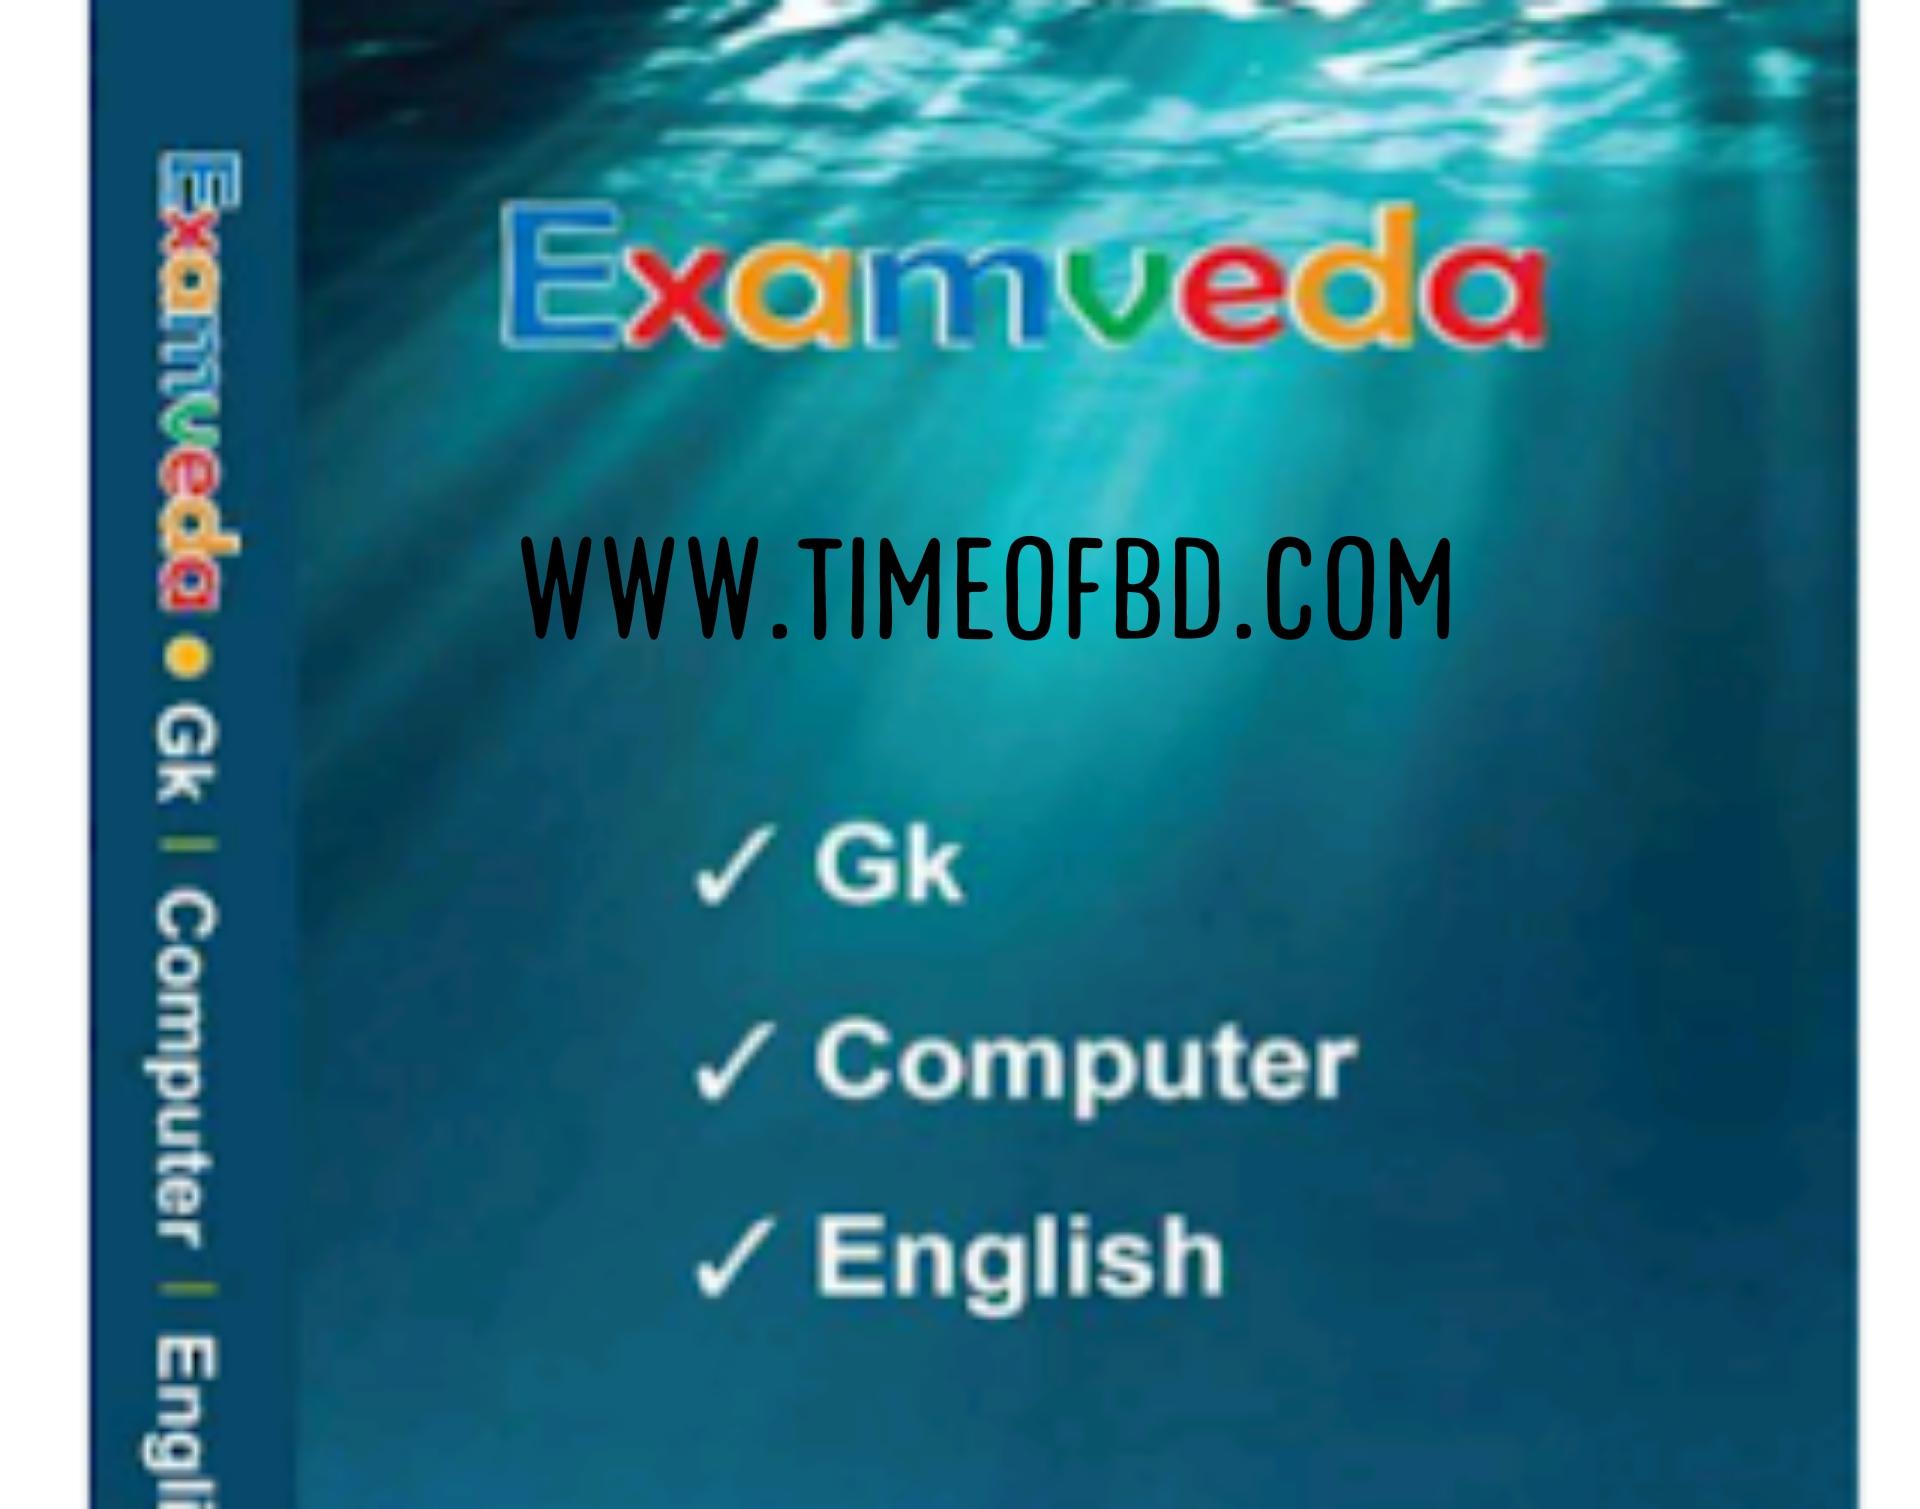 examveda gk,examveda gk site link,examveda gk subject, examveda gk example, exanveda gk question and answer